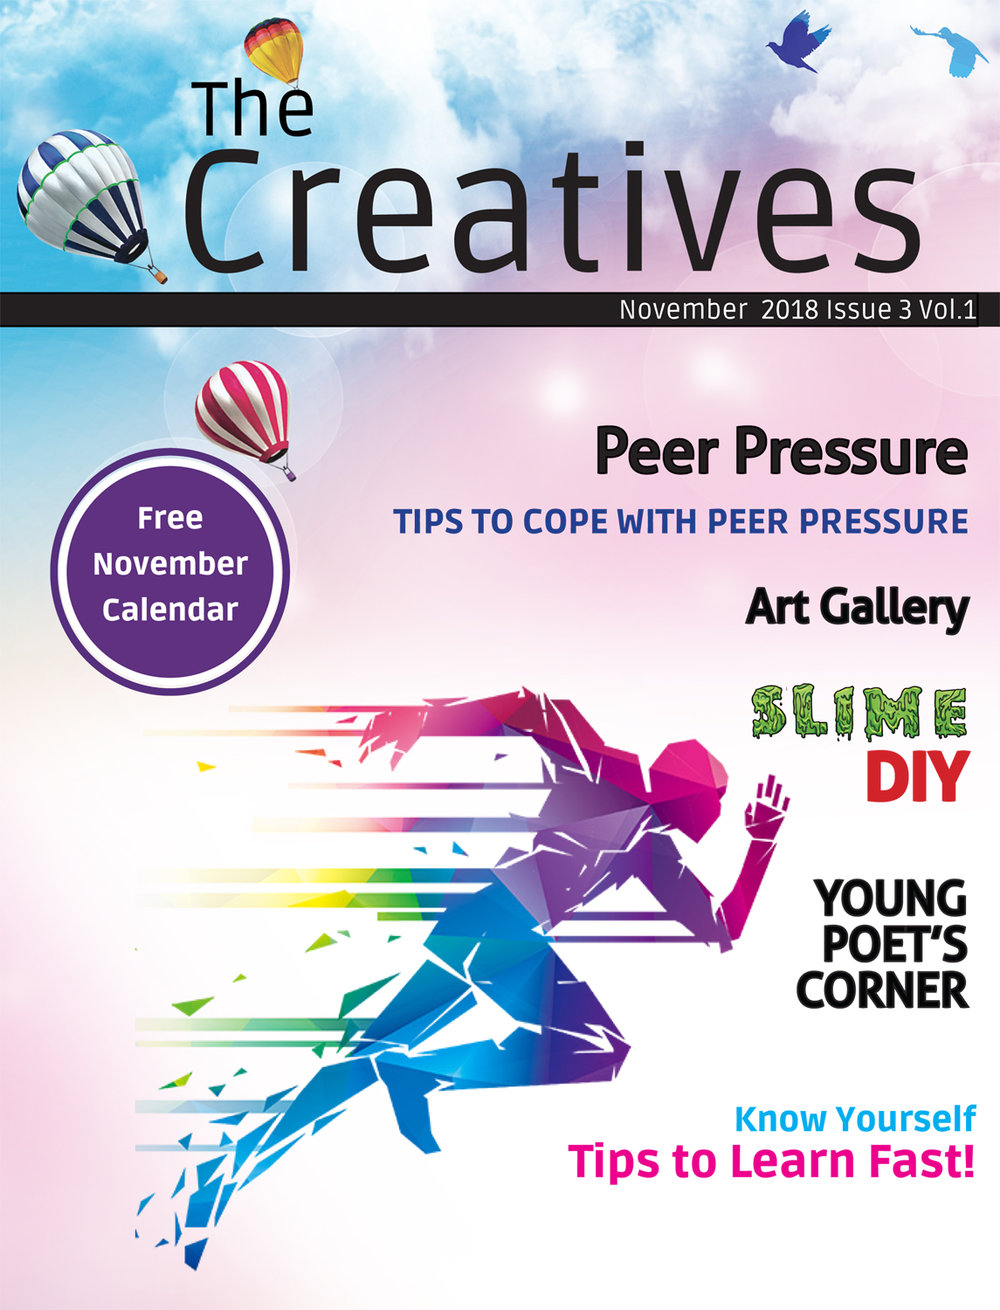 Creatives_Nov RN Printers_final 2.jpg